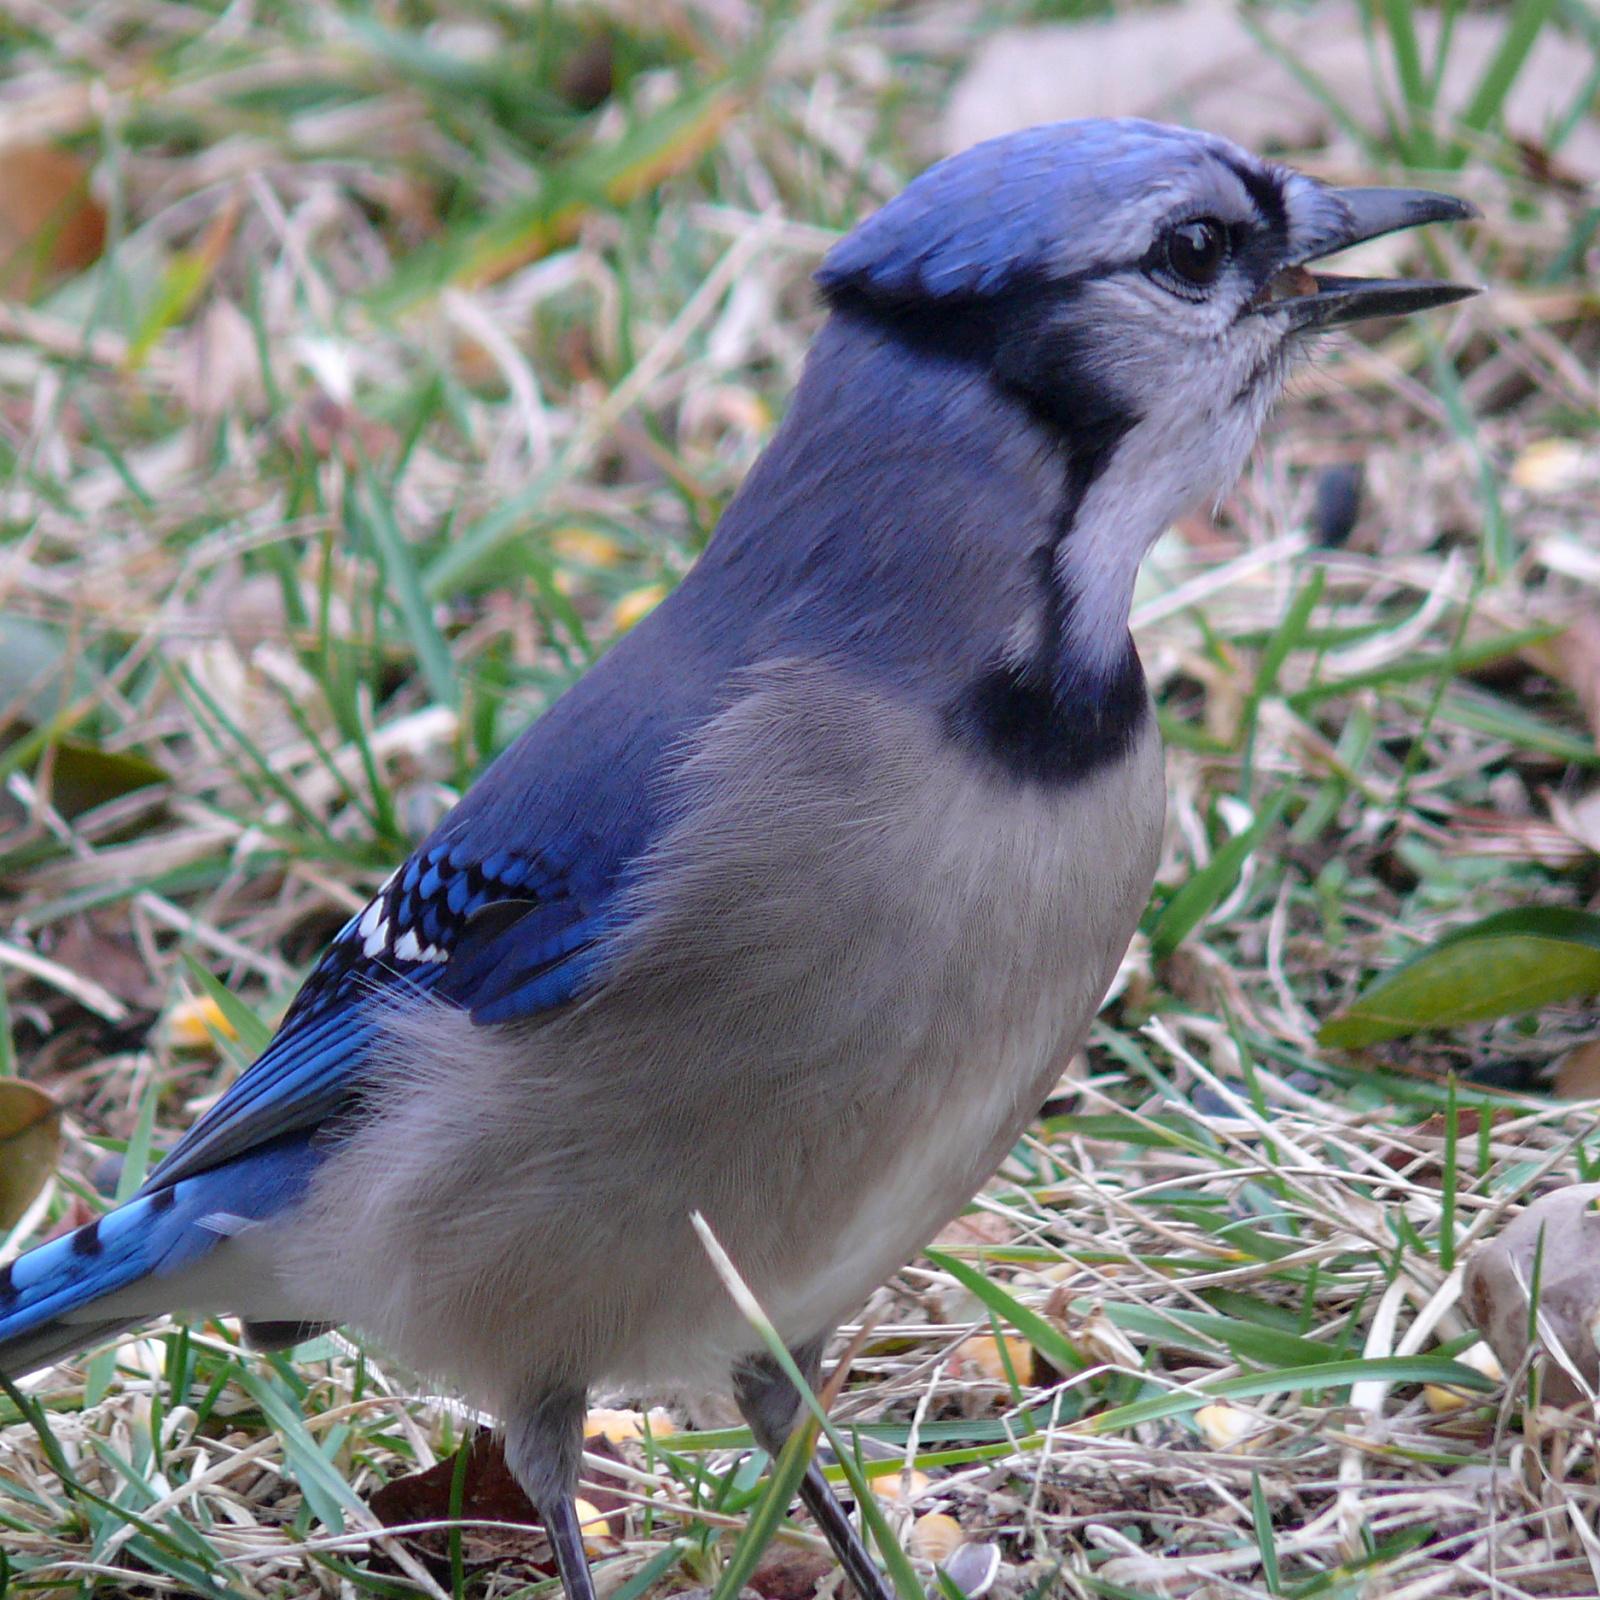 Wild life: Blue jay | wild birds